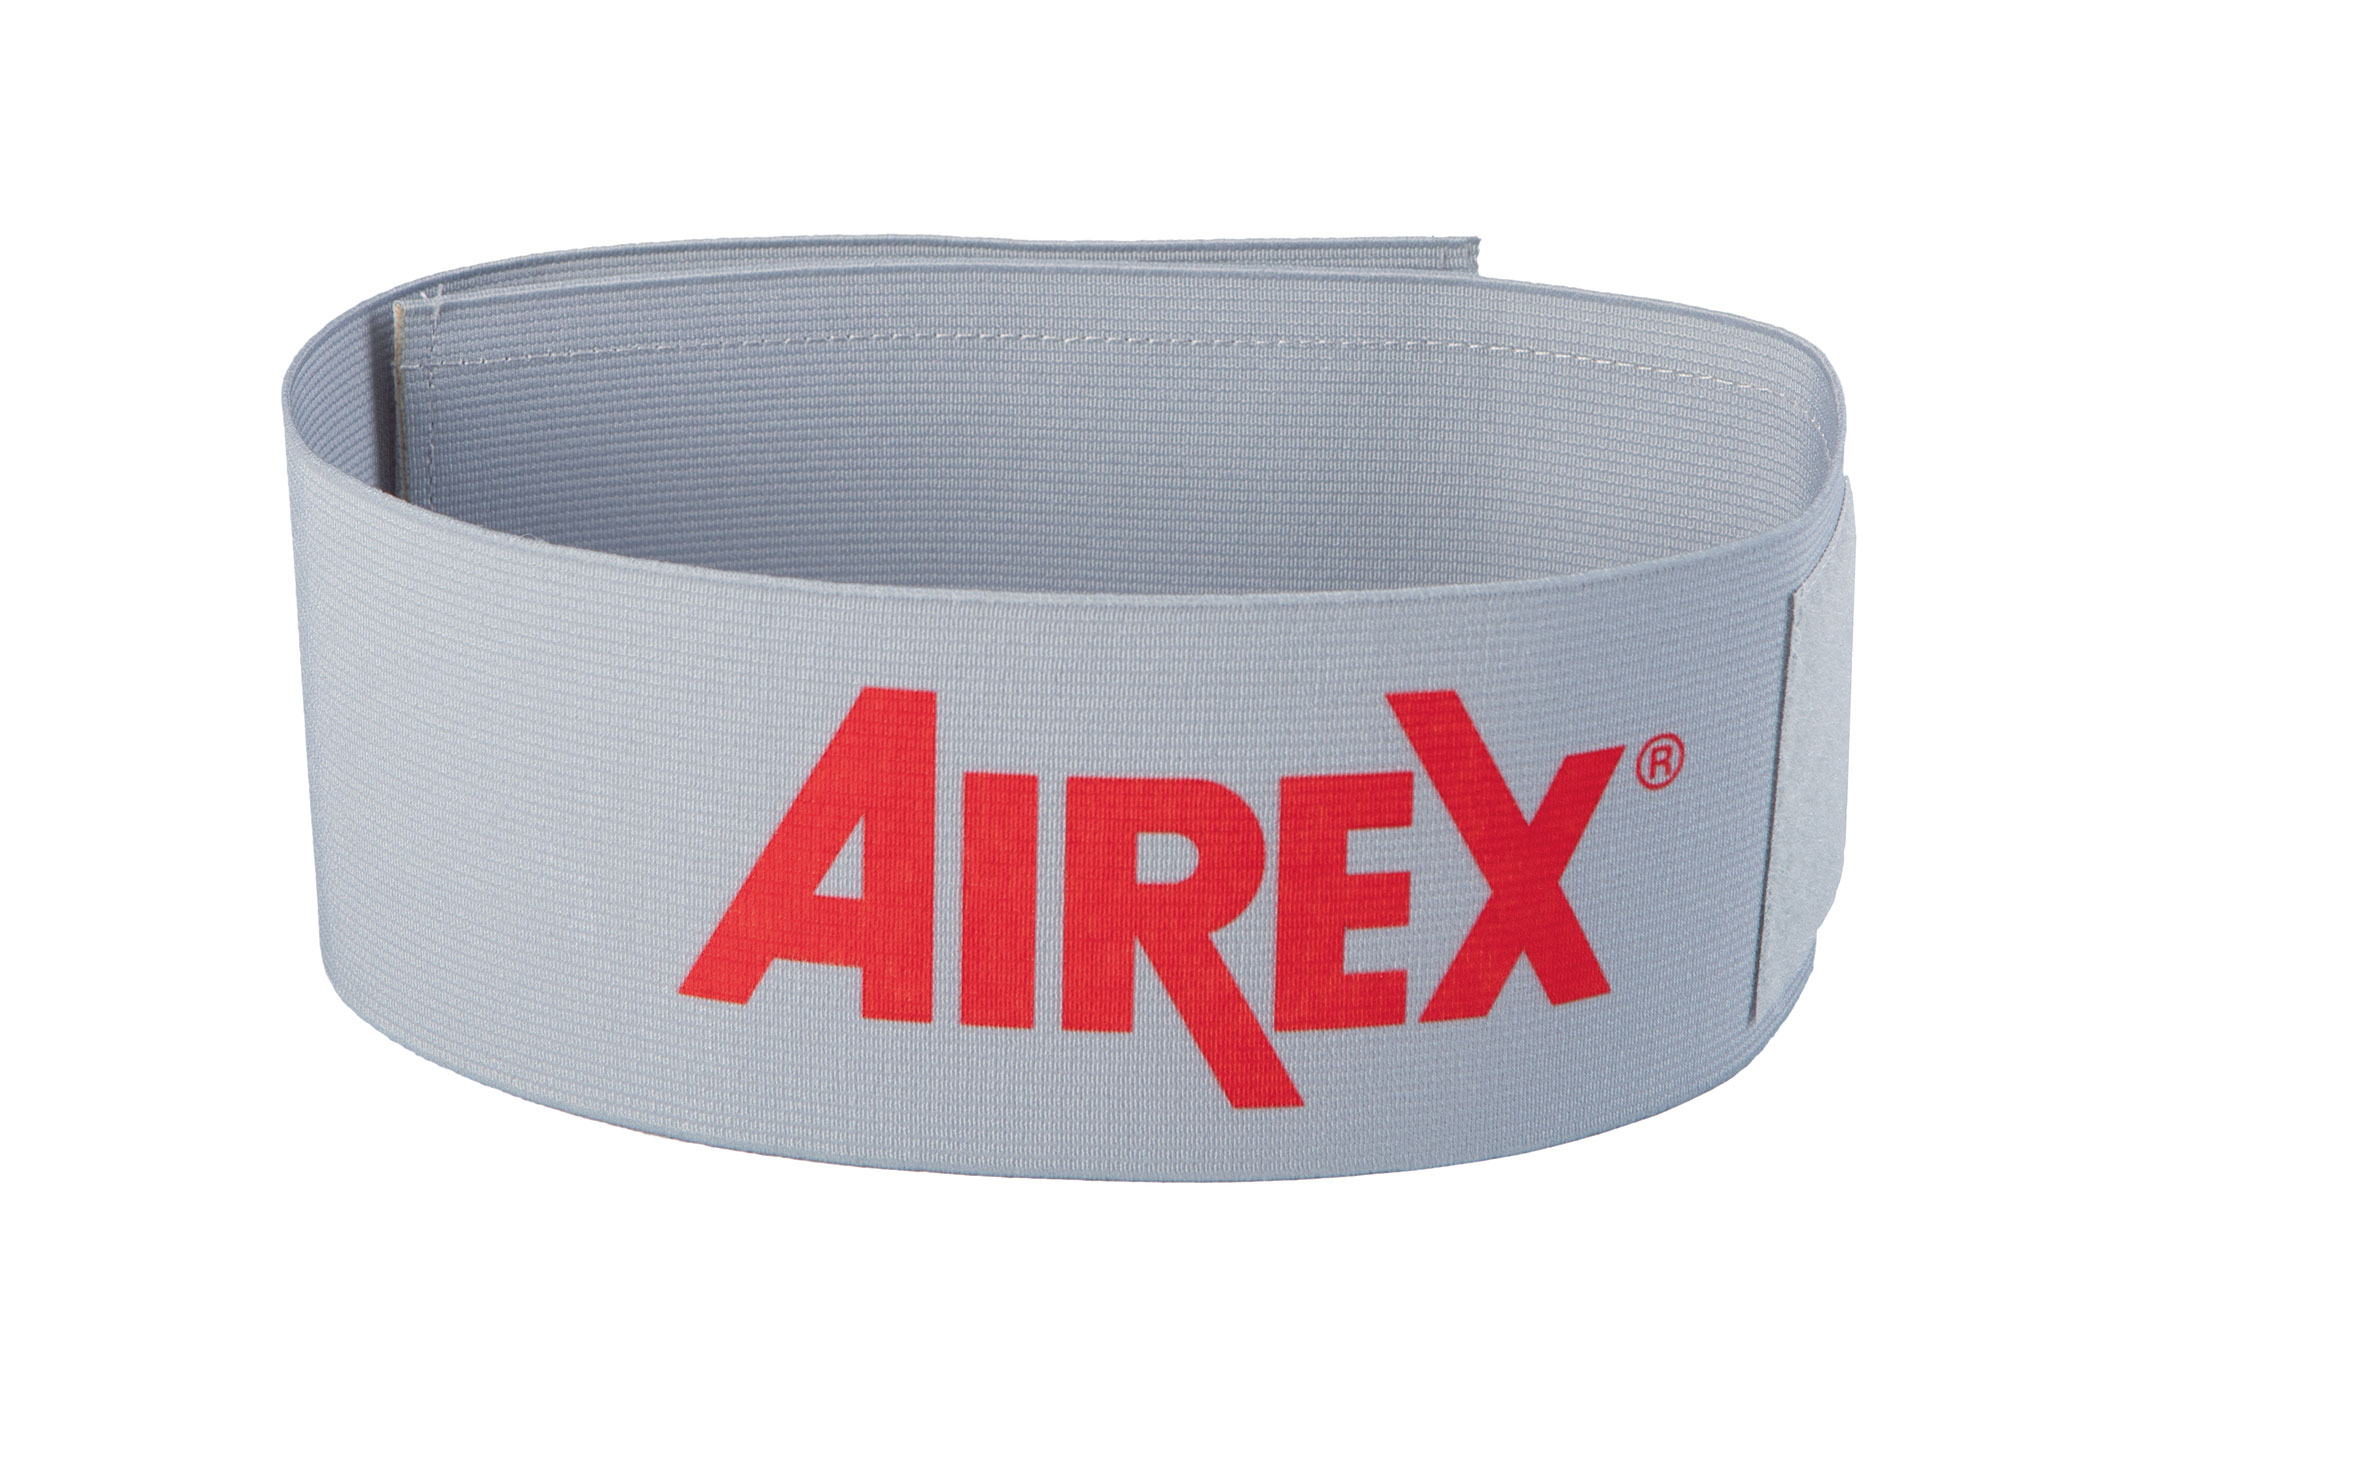 Flexible Mat holding strap